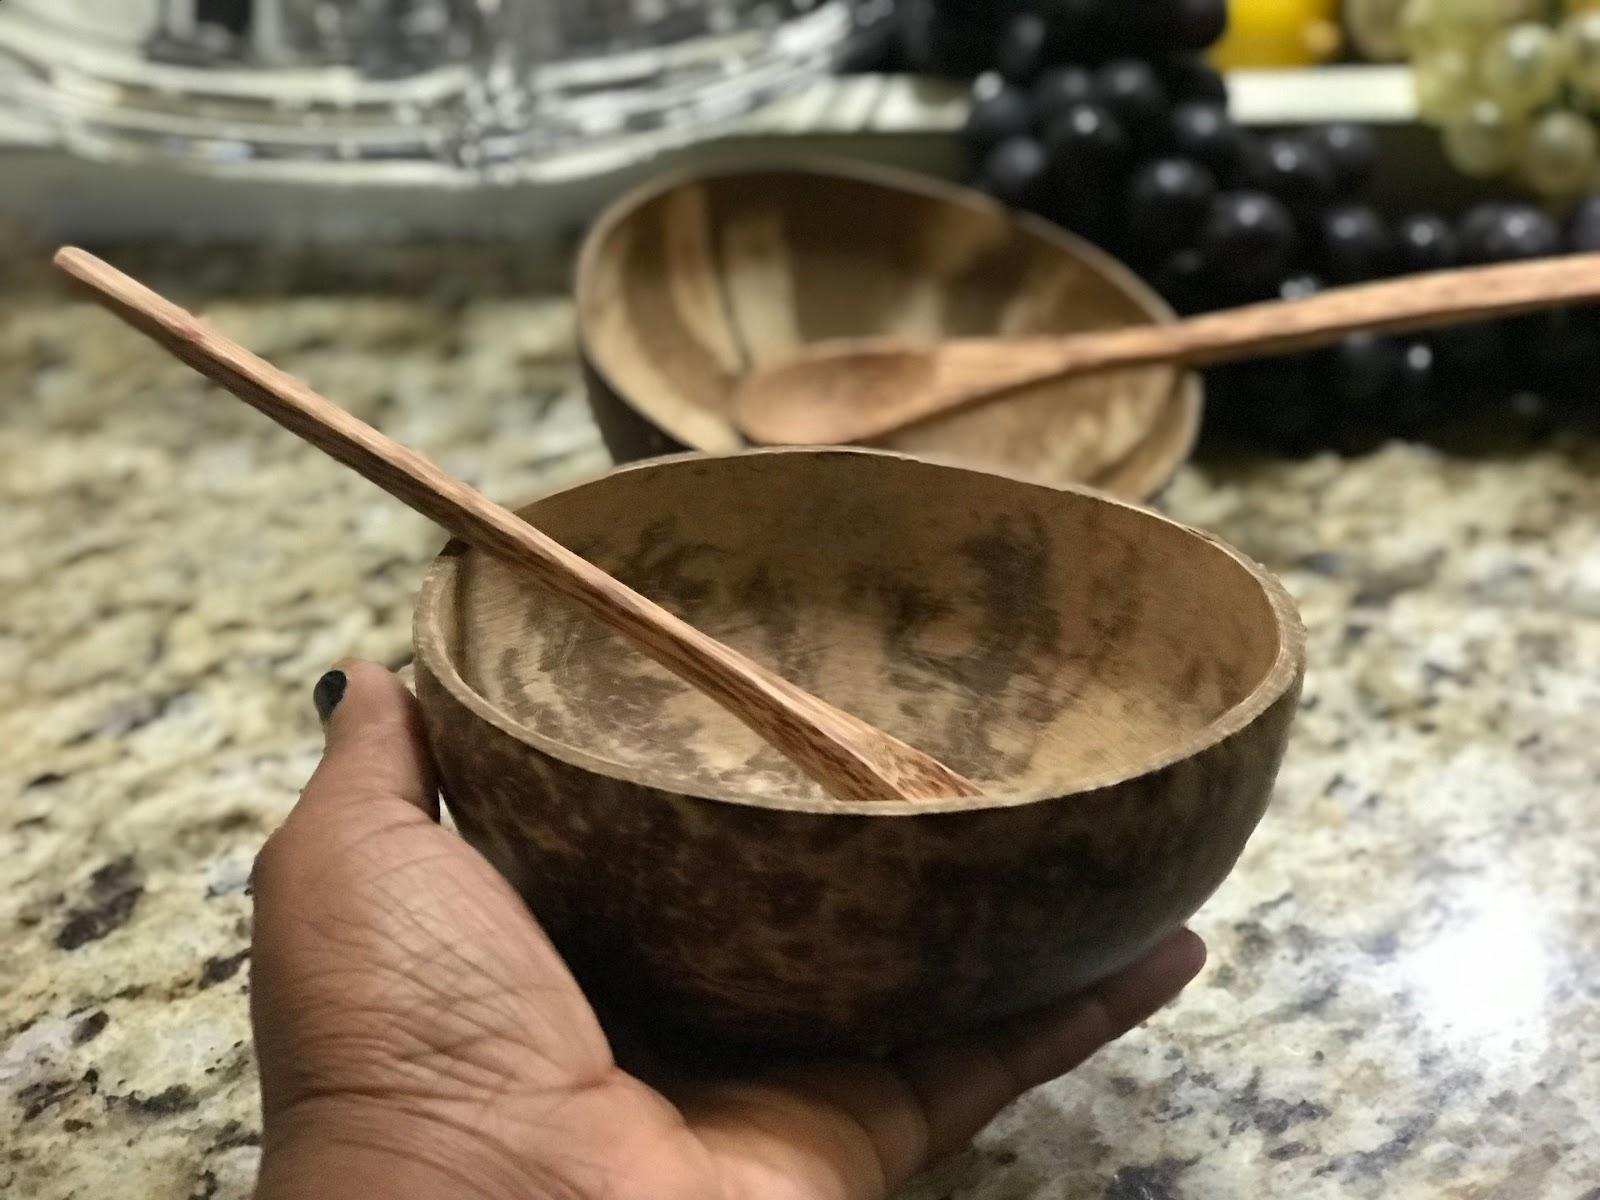 Image: Coconut bowls